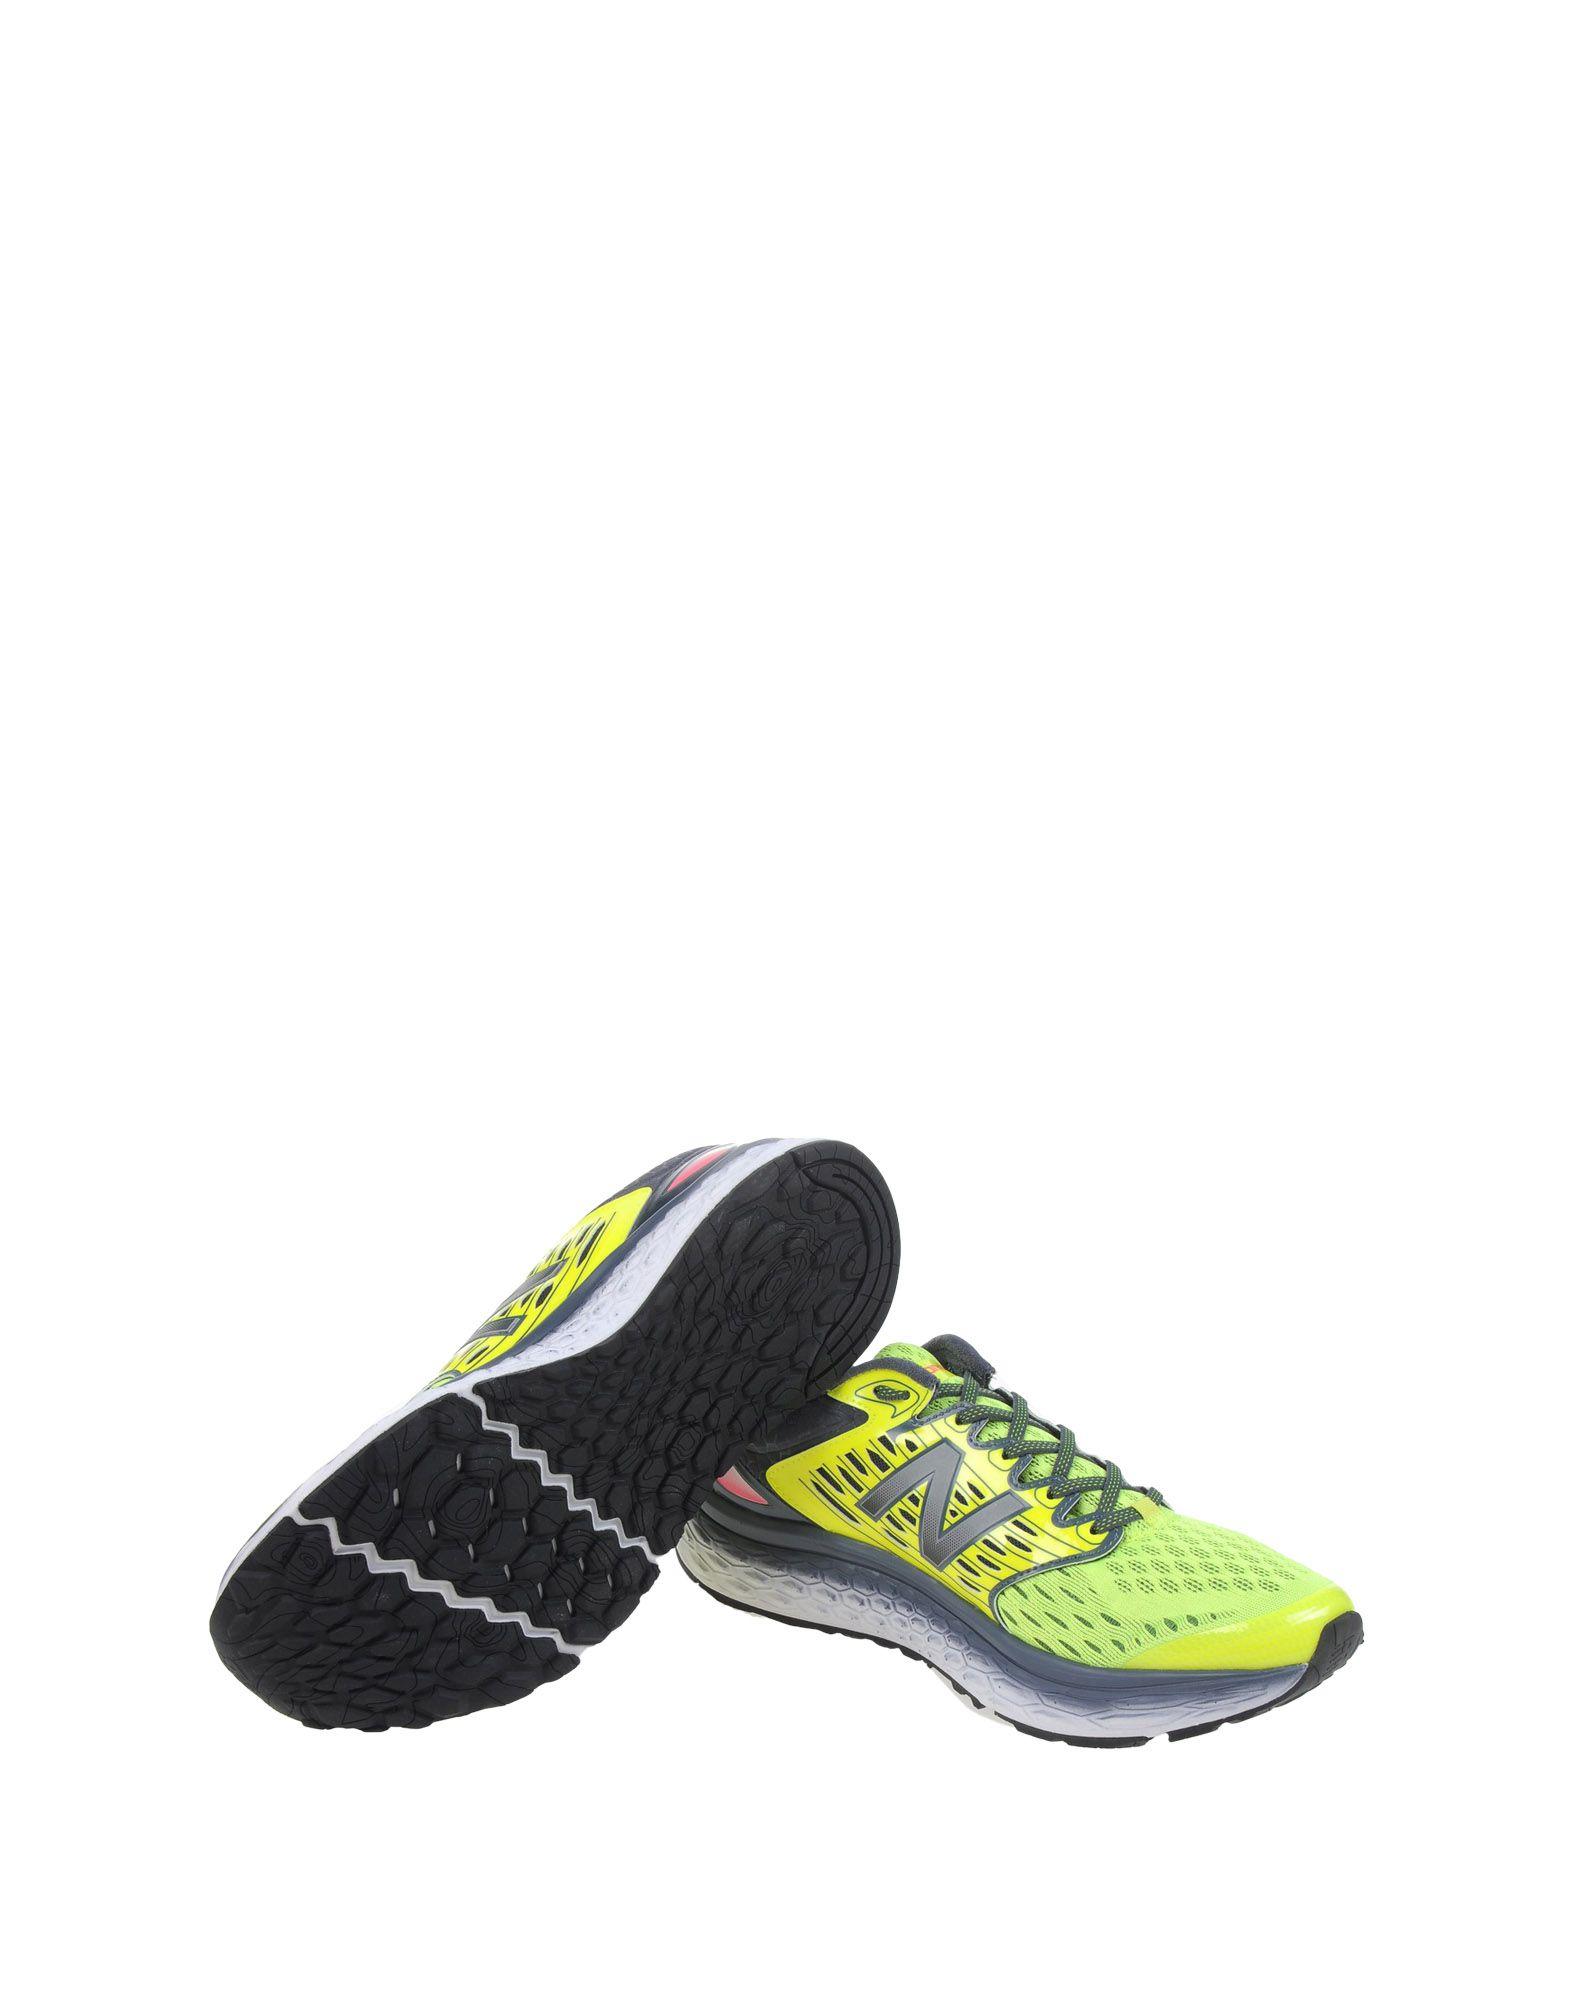 Sneakers New Balance Fresh Foam 1080 - Homme - Sneakers New Balance sur